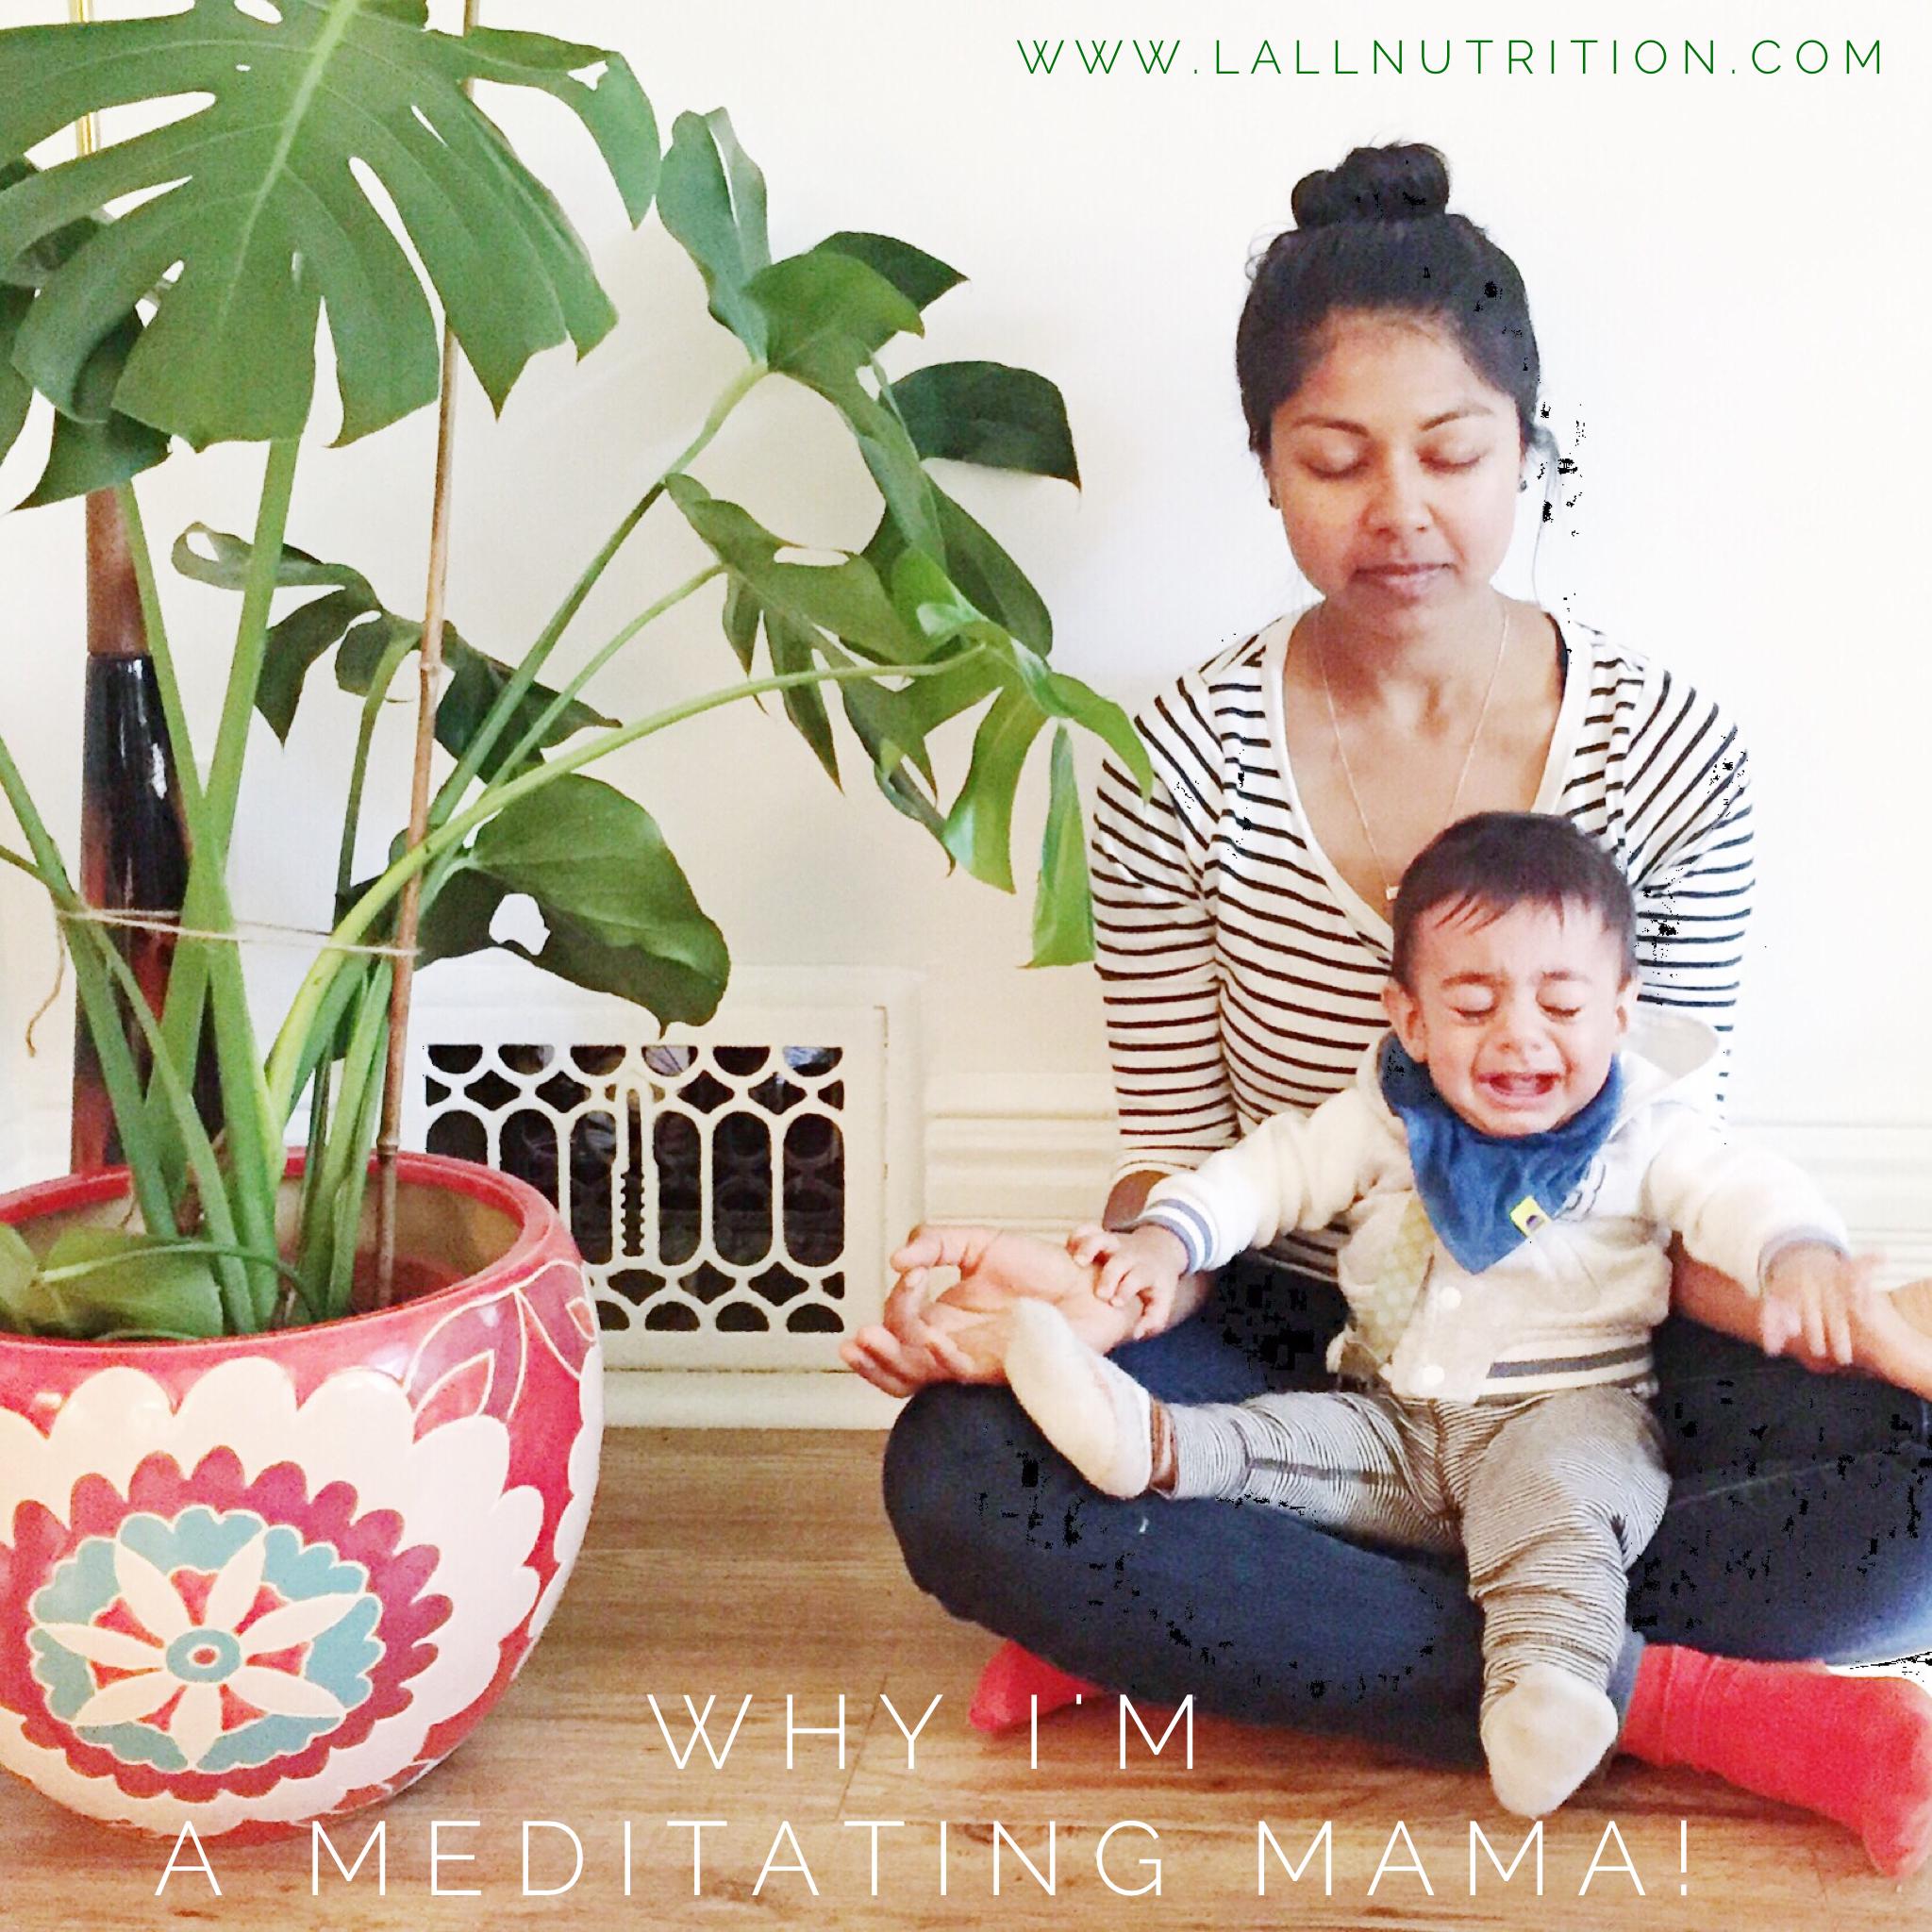 Why I'm a Meditating Mama!